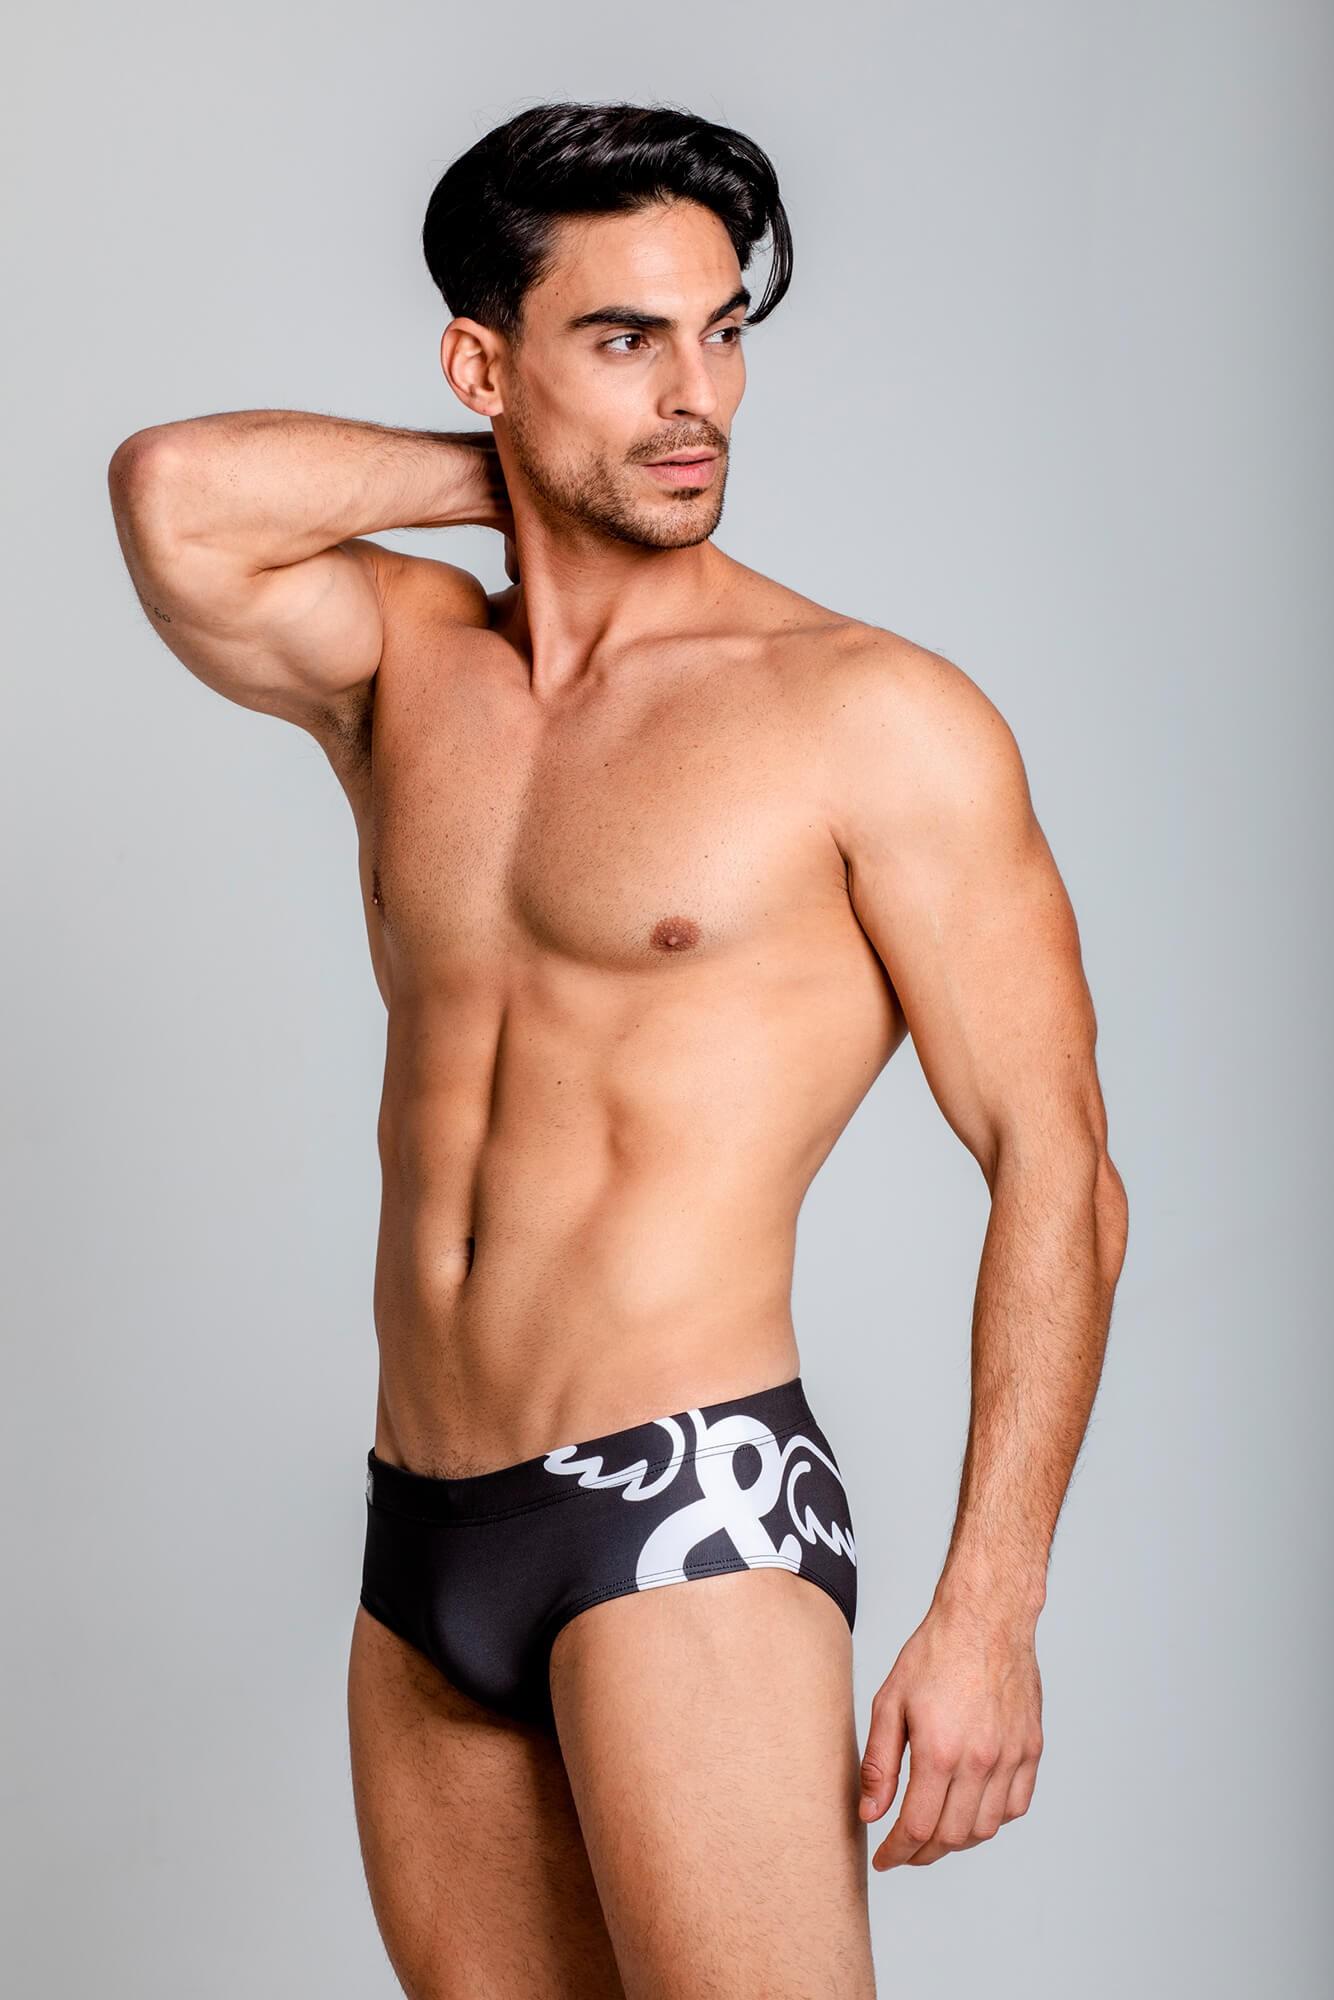 Bañador Titan Swim Brief para modelaje o fitness. Estilo urbano marca ELIU streetwear.